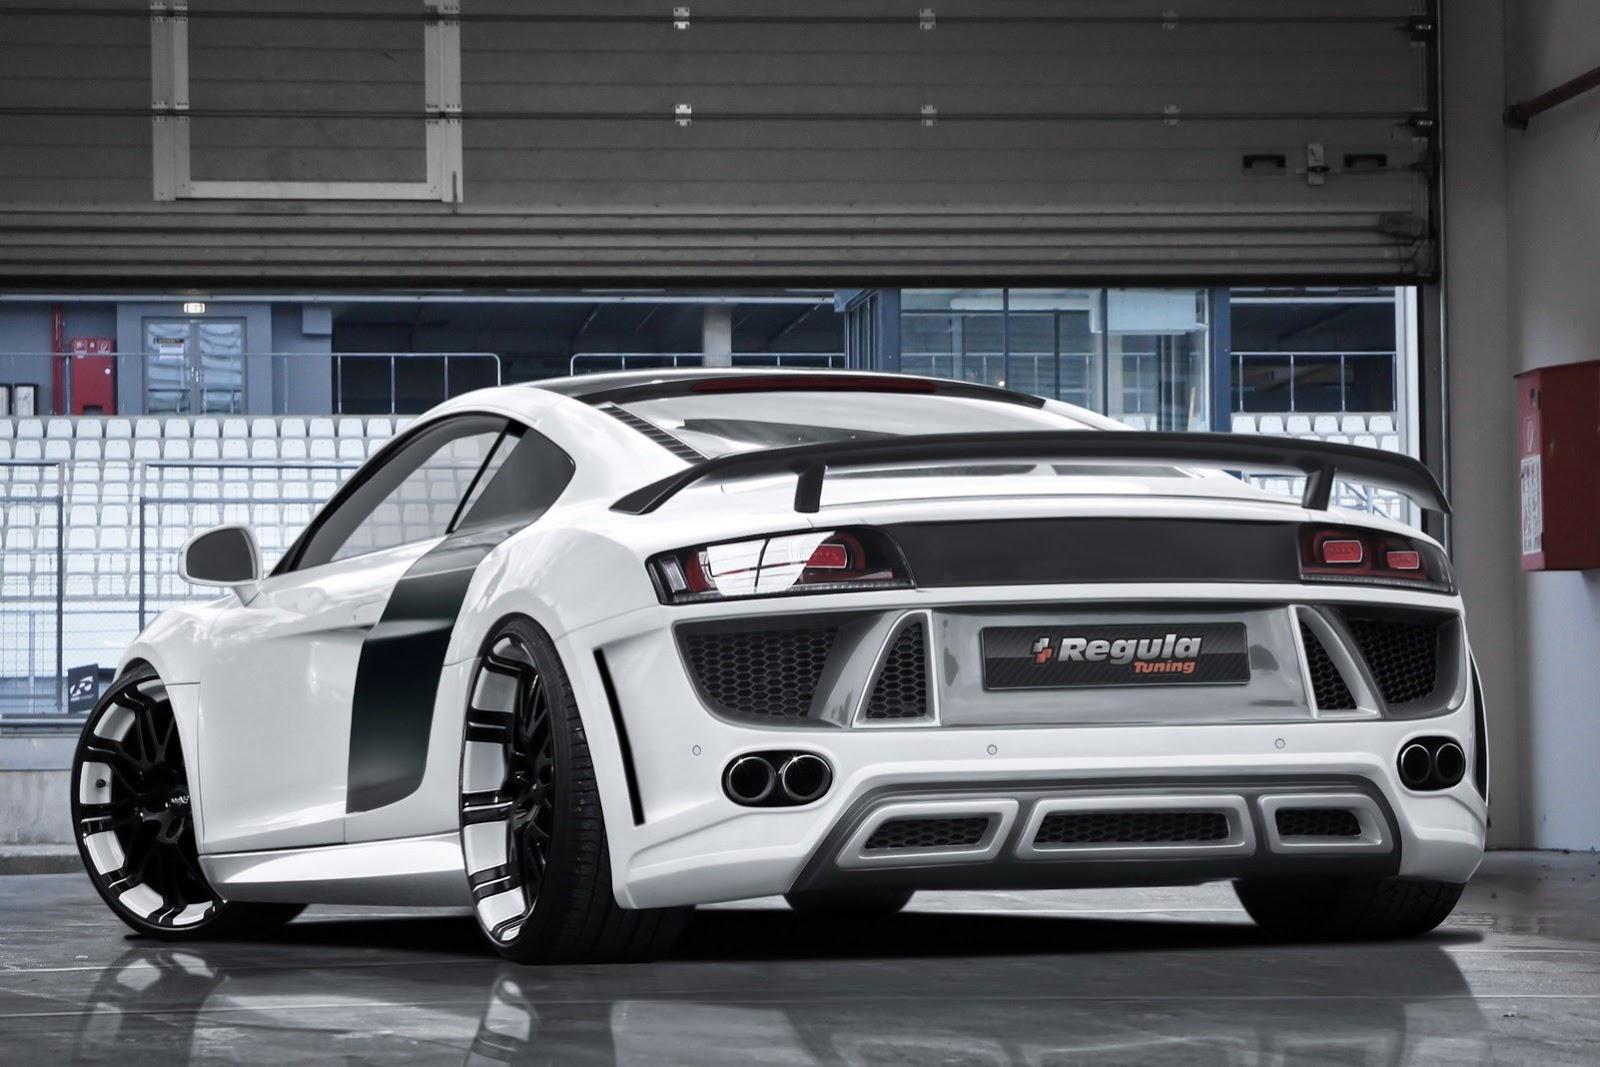 Regula Tuning Audi R on Audi R8 Regula